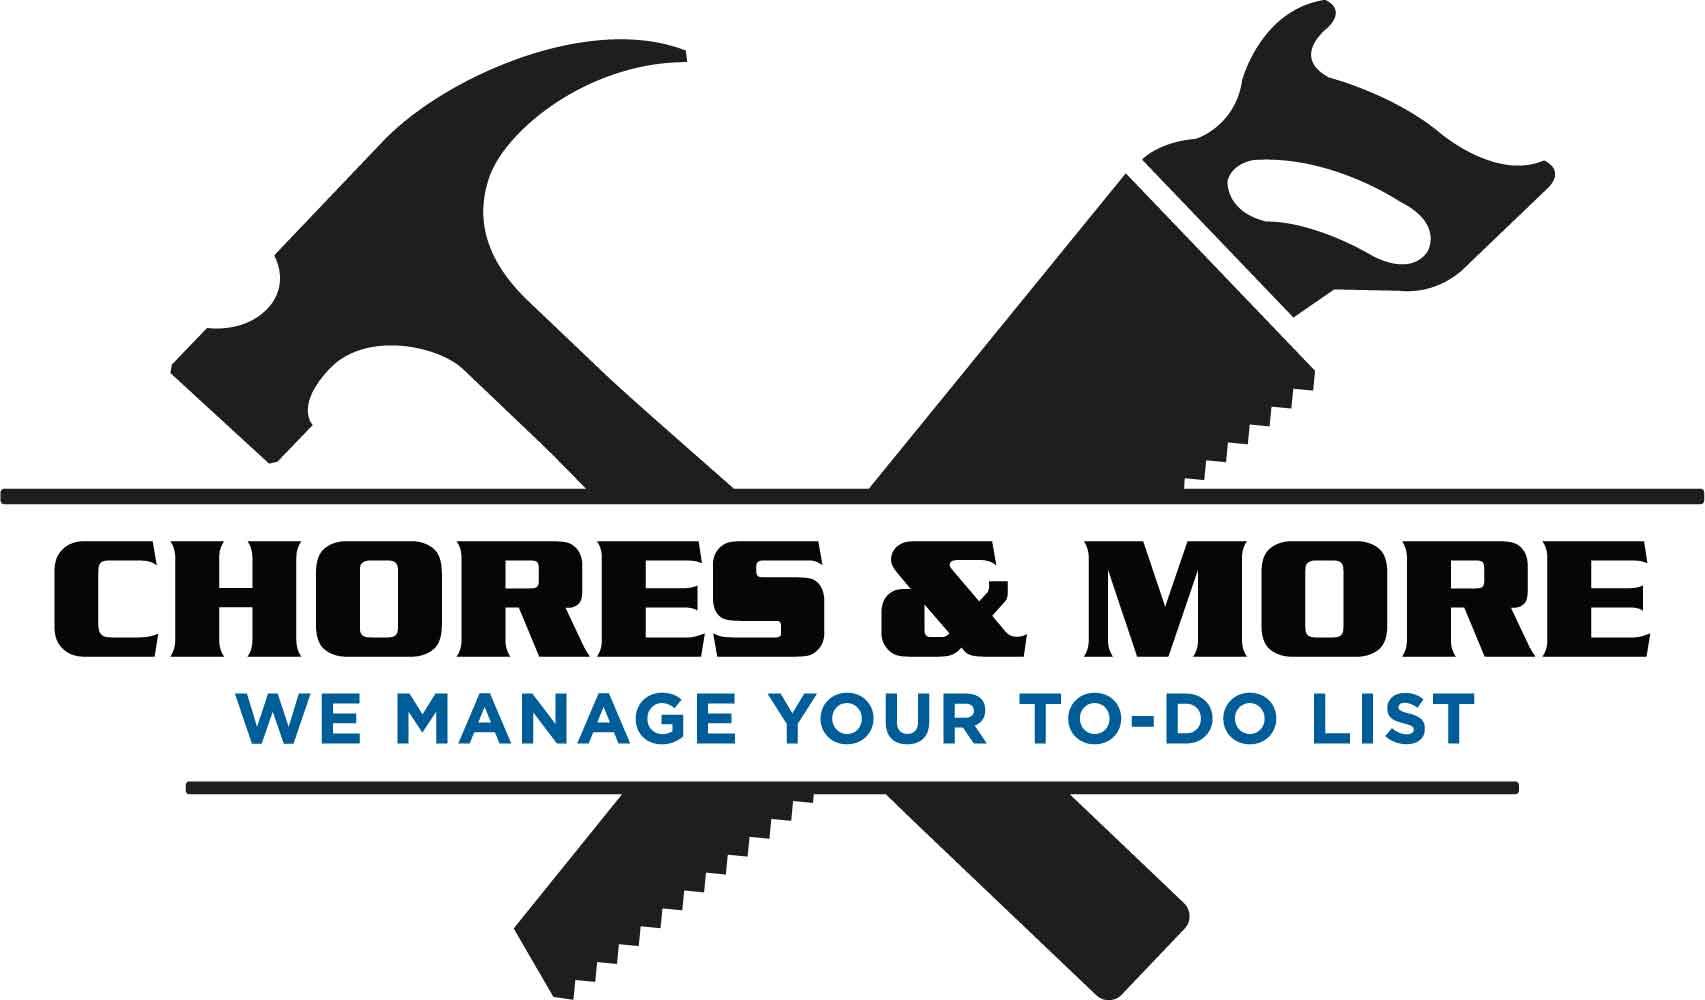 Chores & More, alumni business sponsor